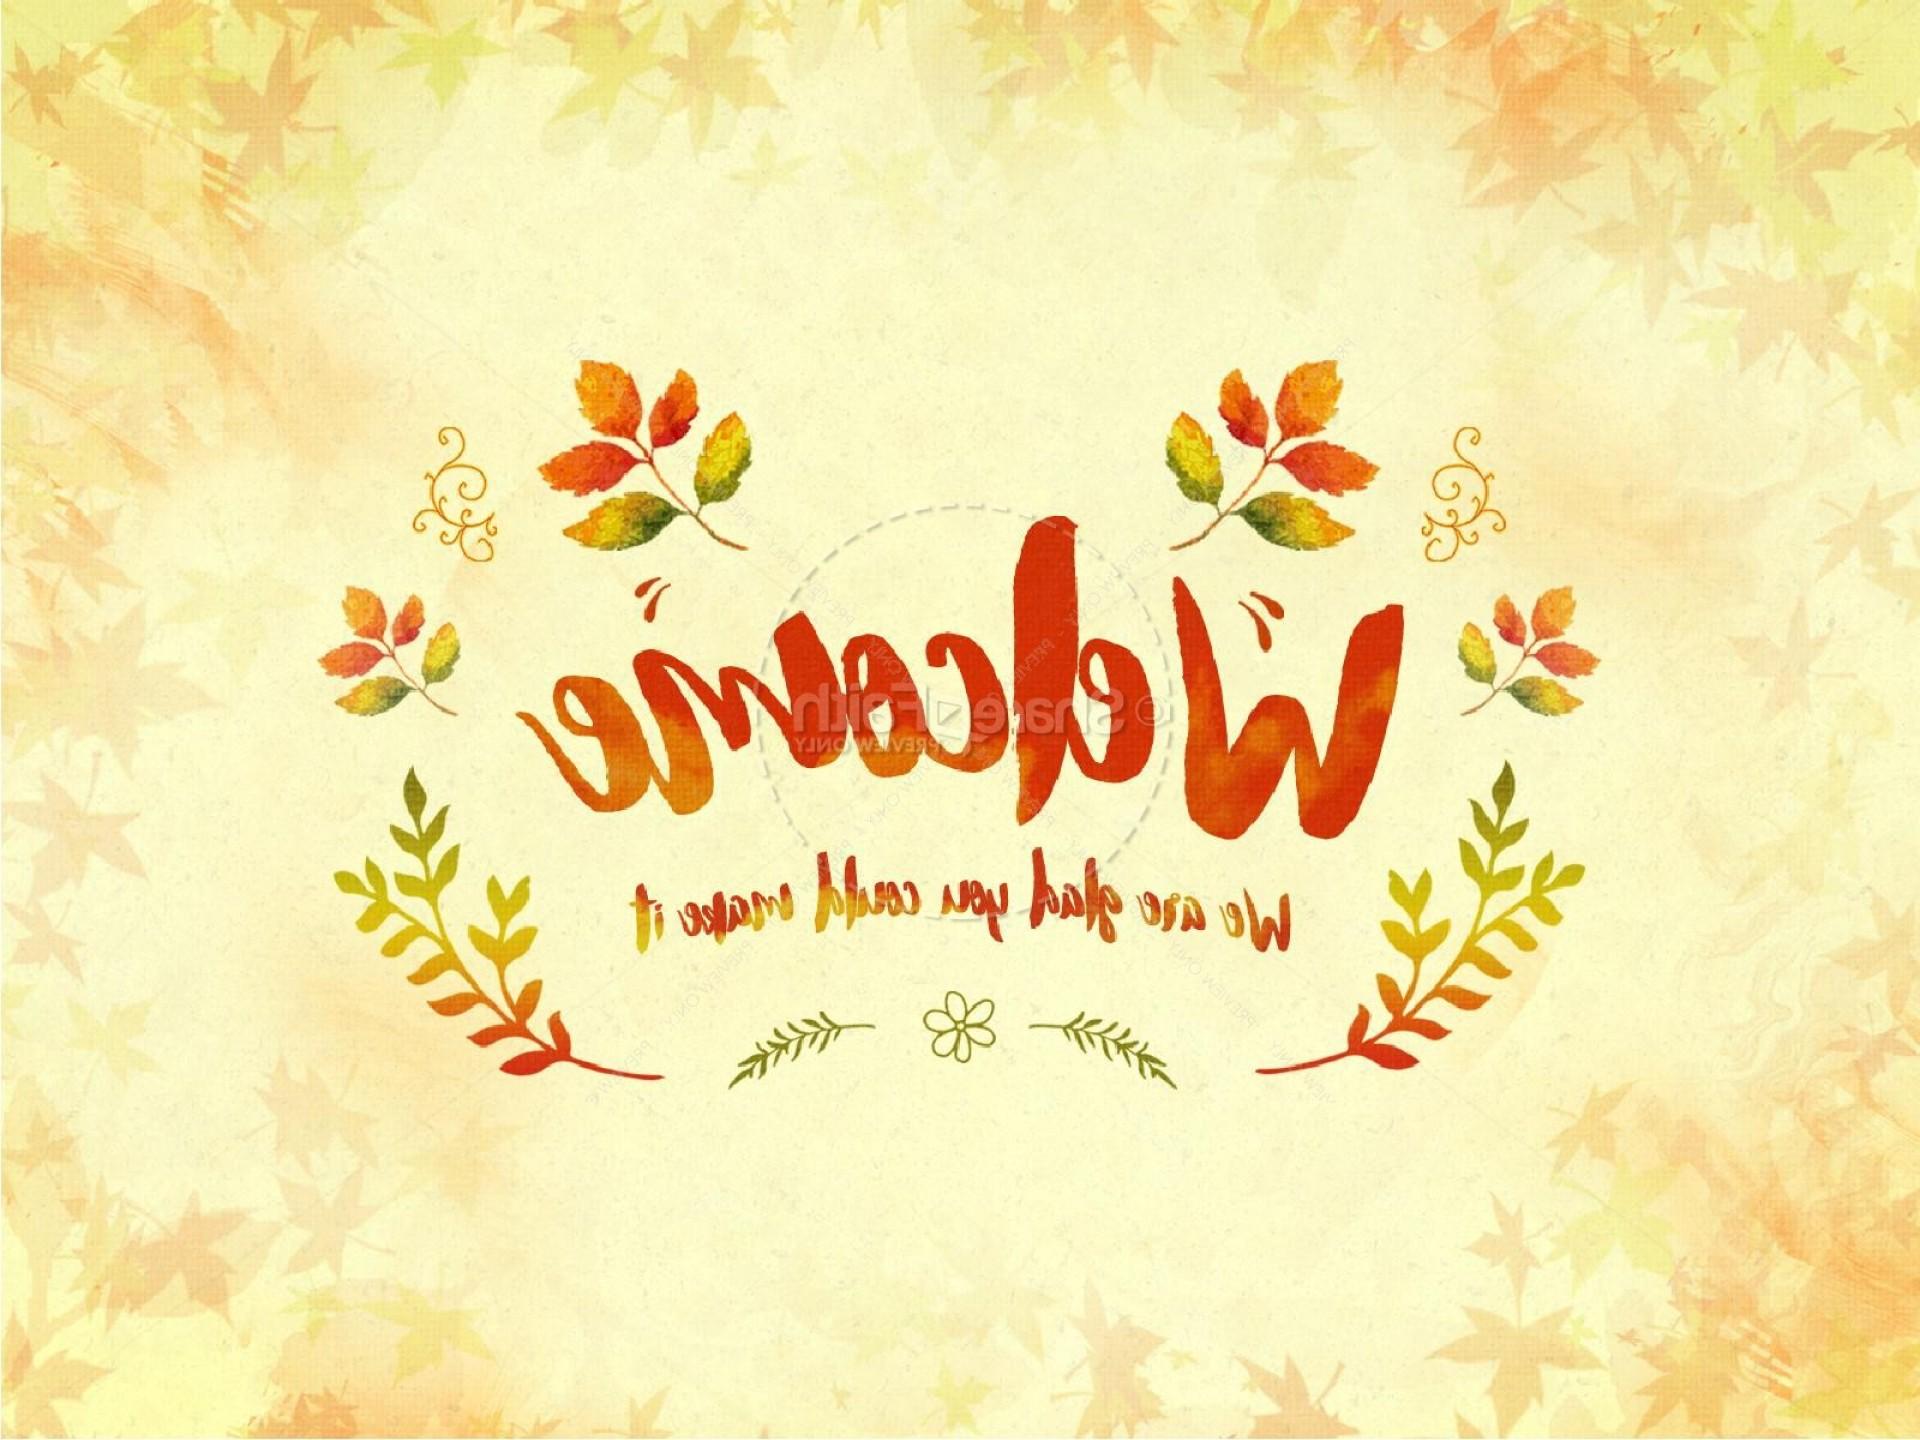 Free Autumn Church Cliparts, Download Free Clip Art, Free Clip Art.